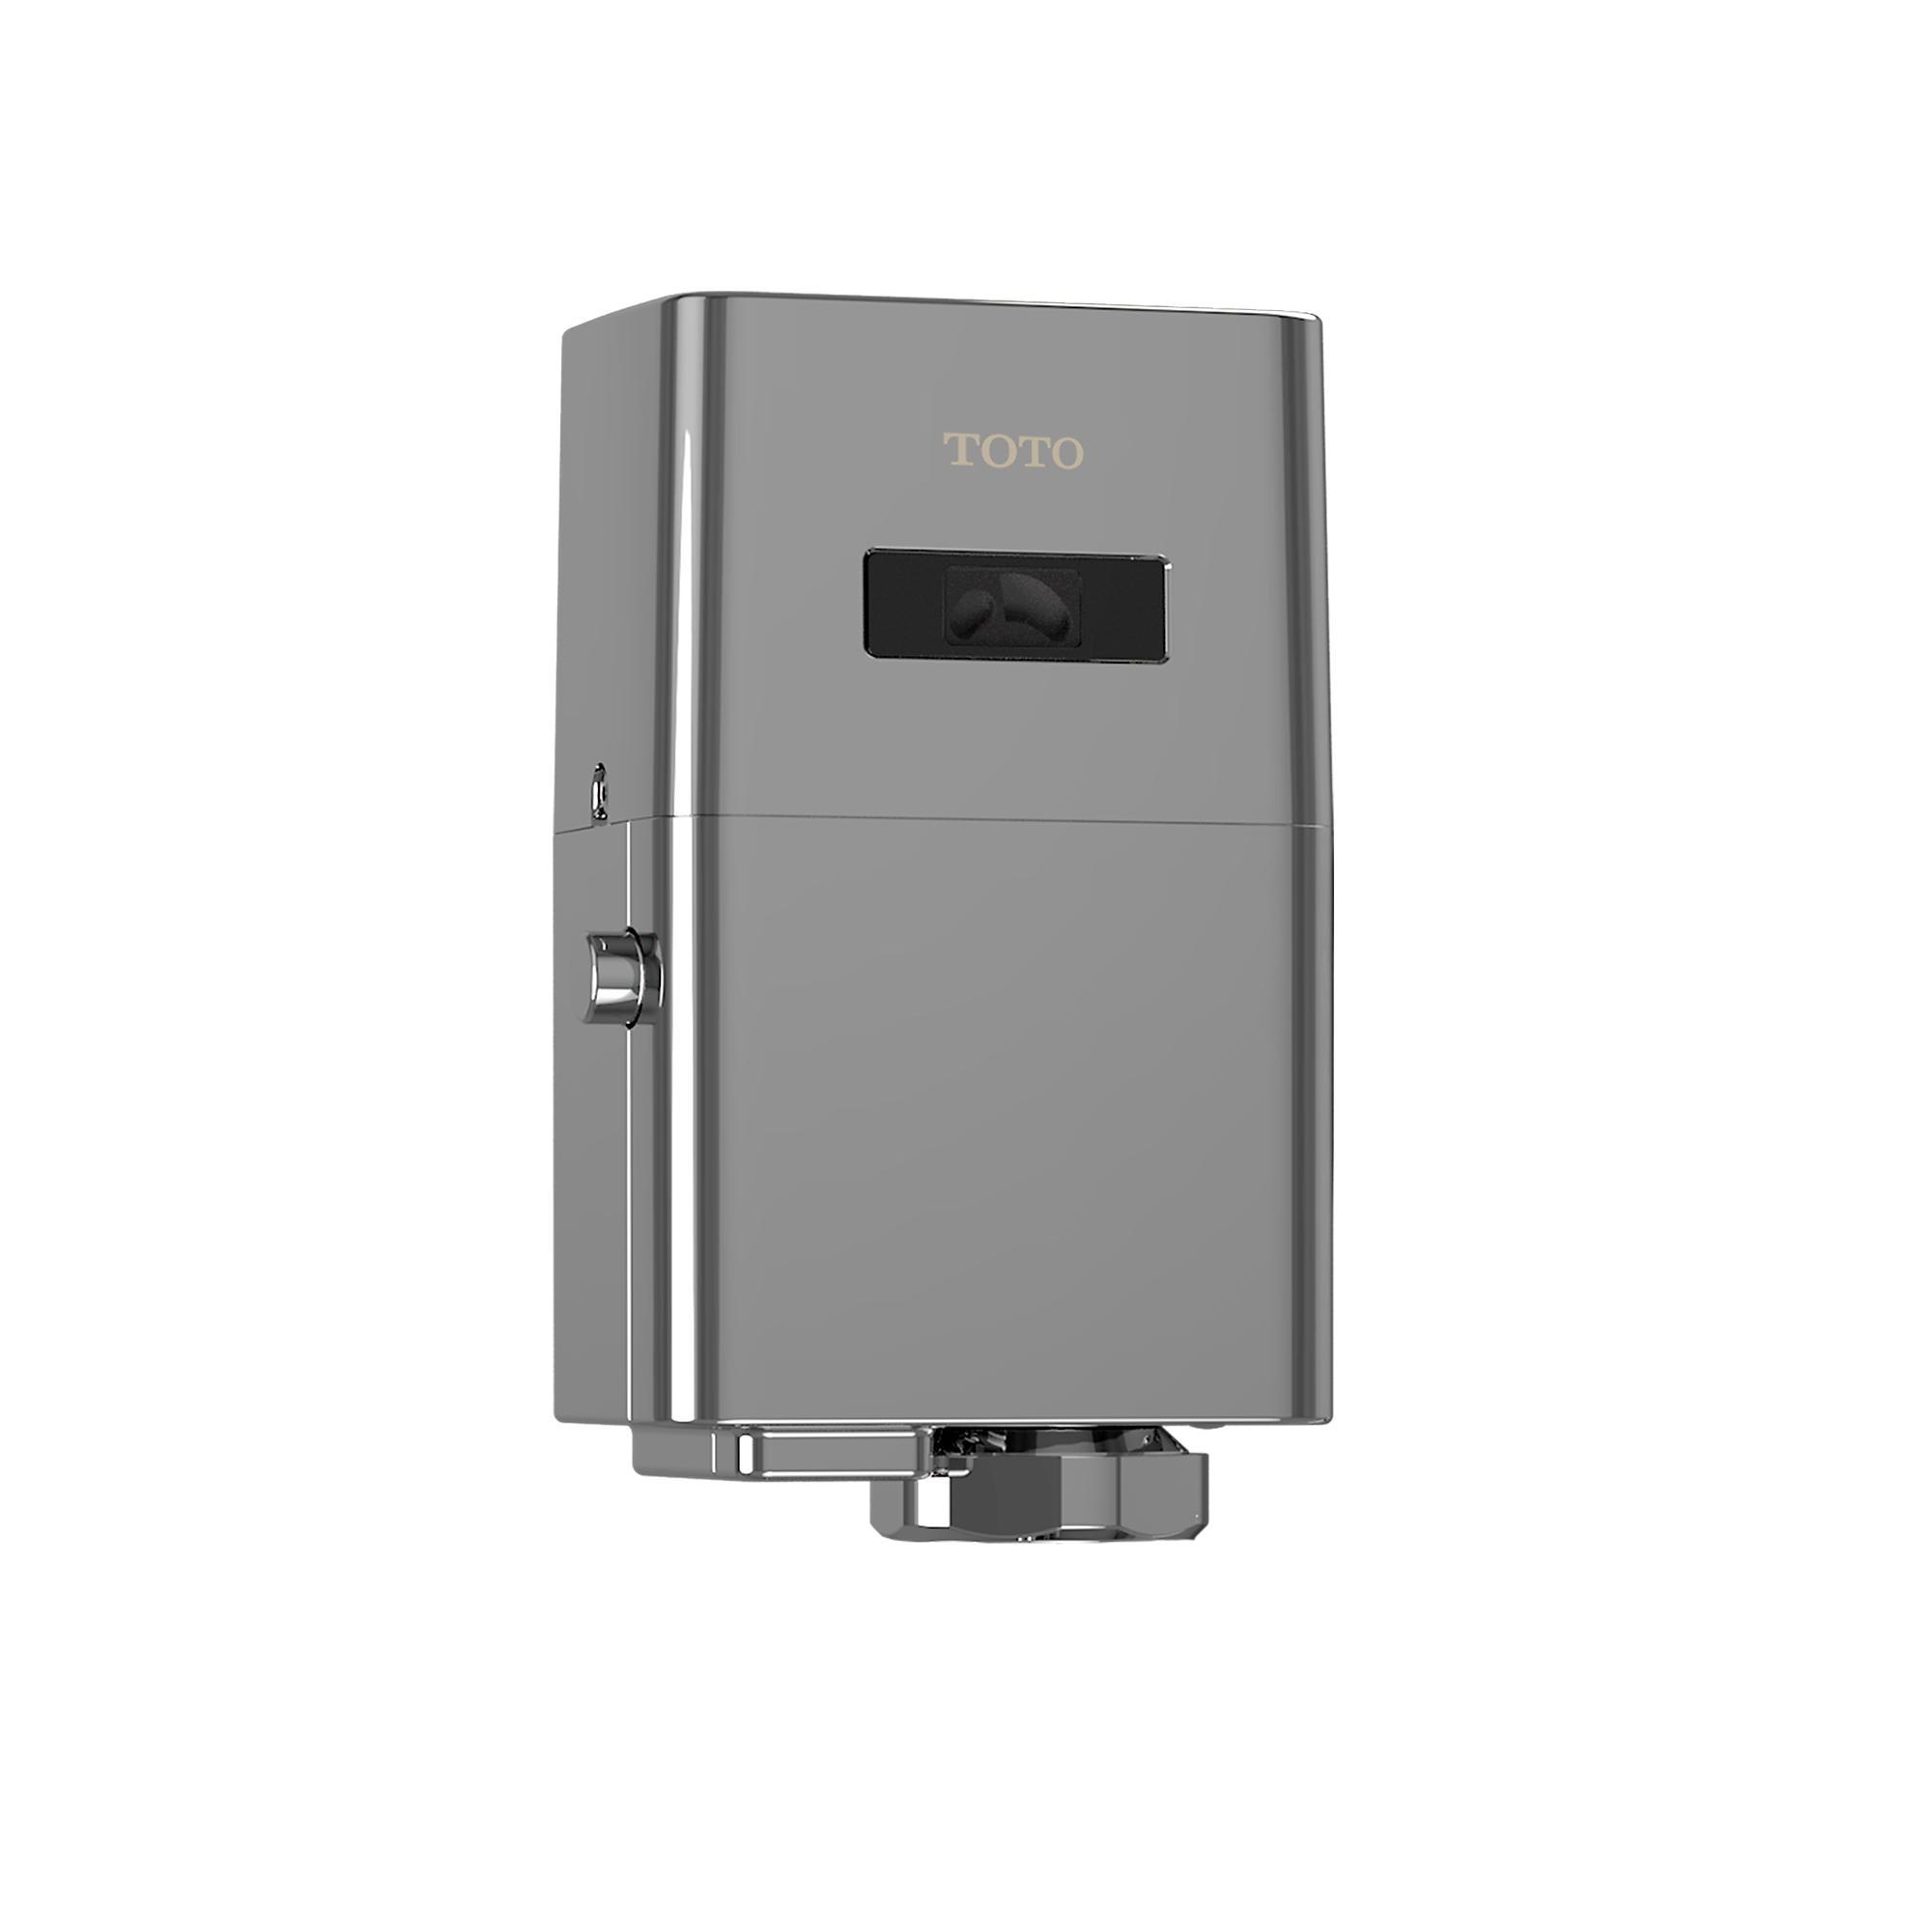 Tet6la cp ecopower  high efficiency toilet flush valve only   1 28 gpf 0